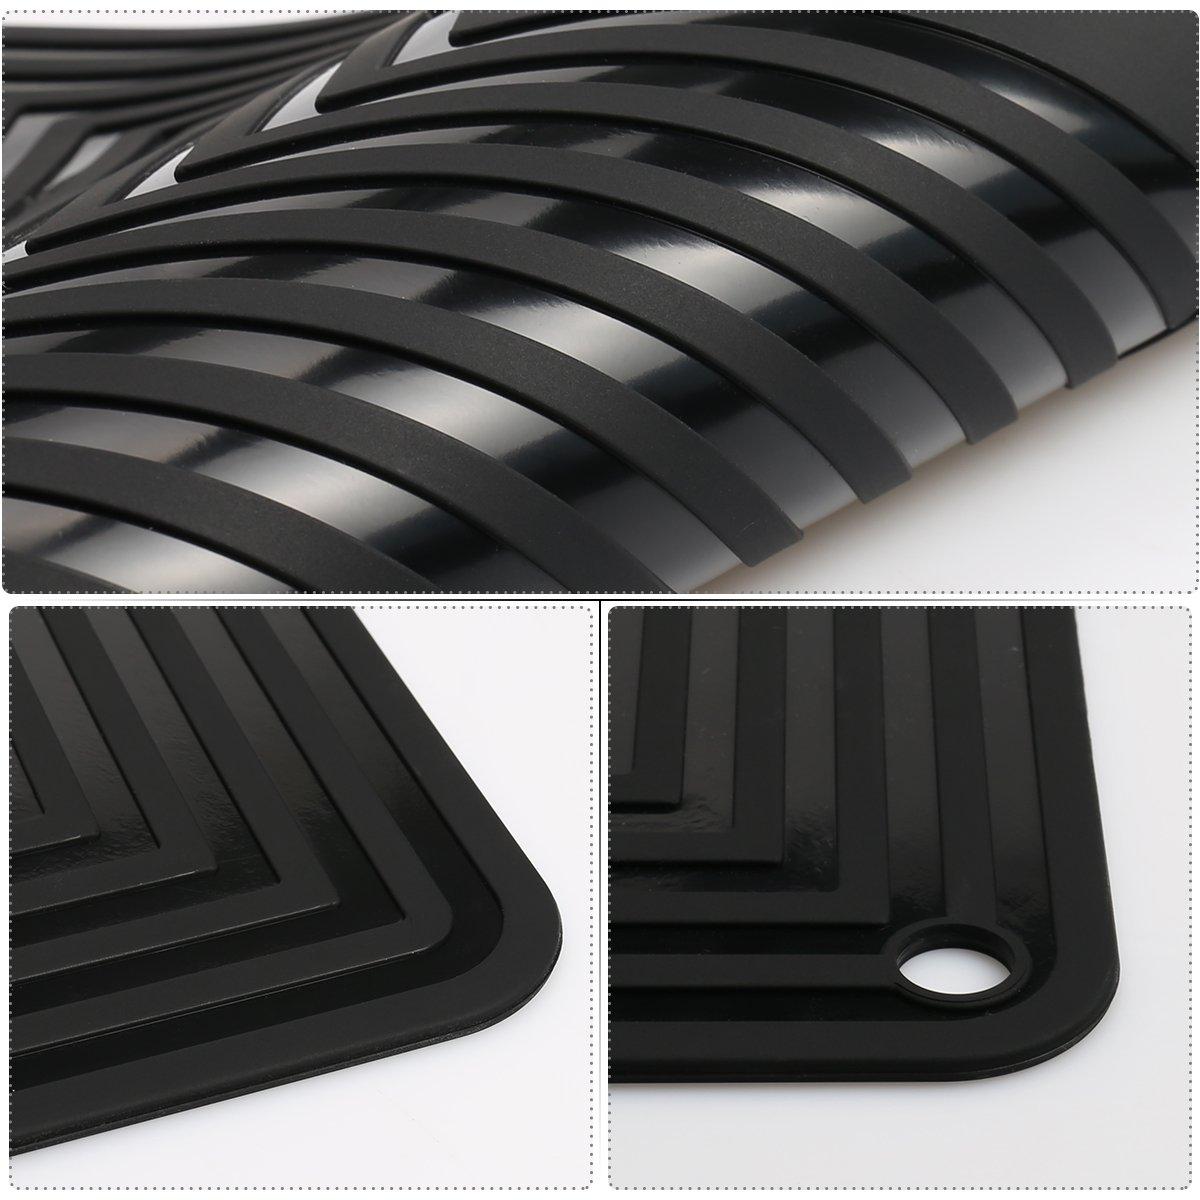 2 Pack,Silicone Trivet Mats/Hot Pads,Pot Holder,9''x12'' Non Slip Flexible Durable Heat Resistant Pot Coaster Kitchen Table Mats (Black) by LogHog (Image #6)